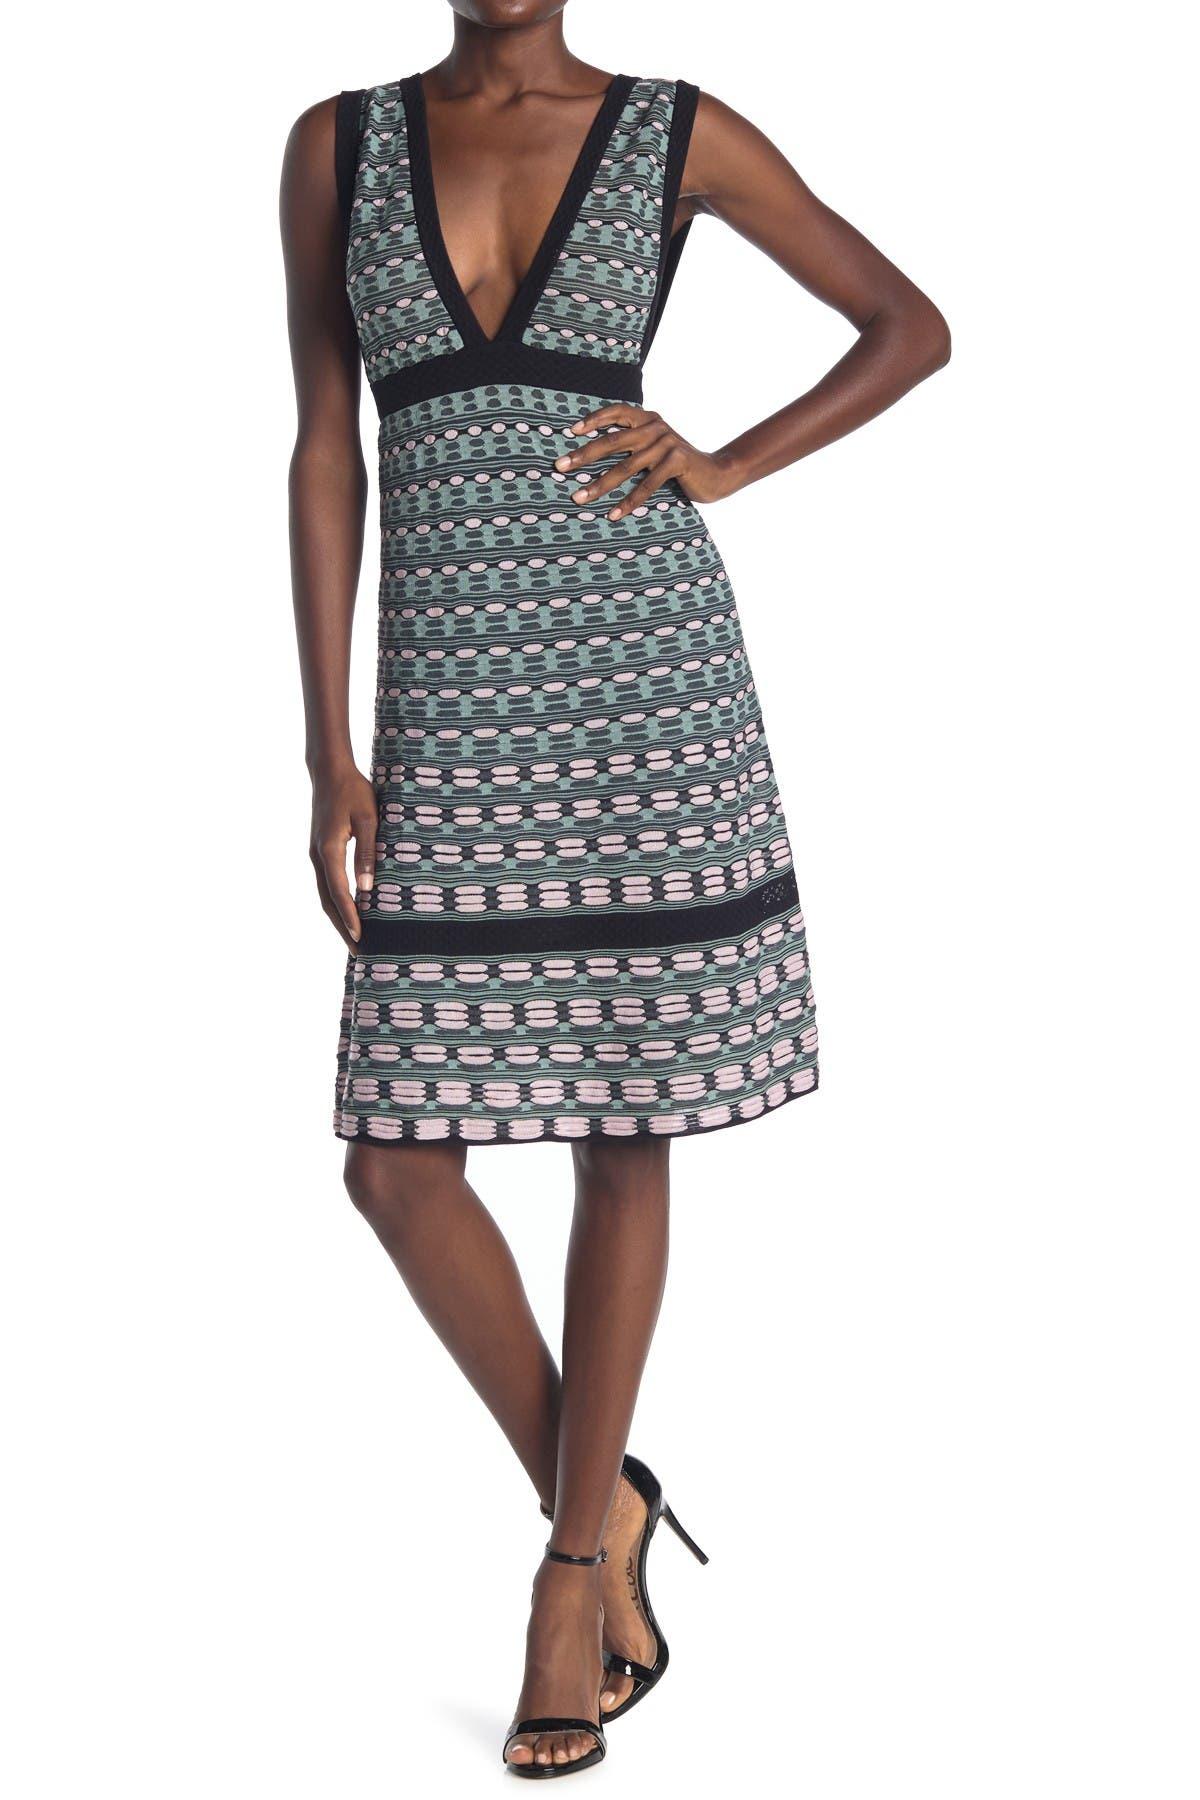 Image of M Missoni Plunge Neck Patterned Dress